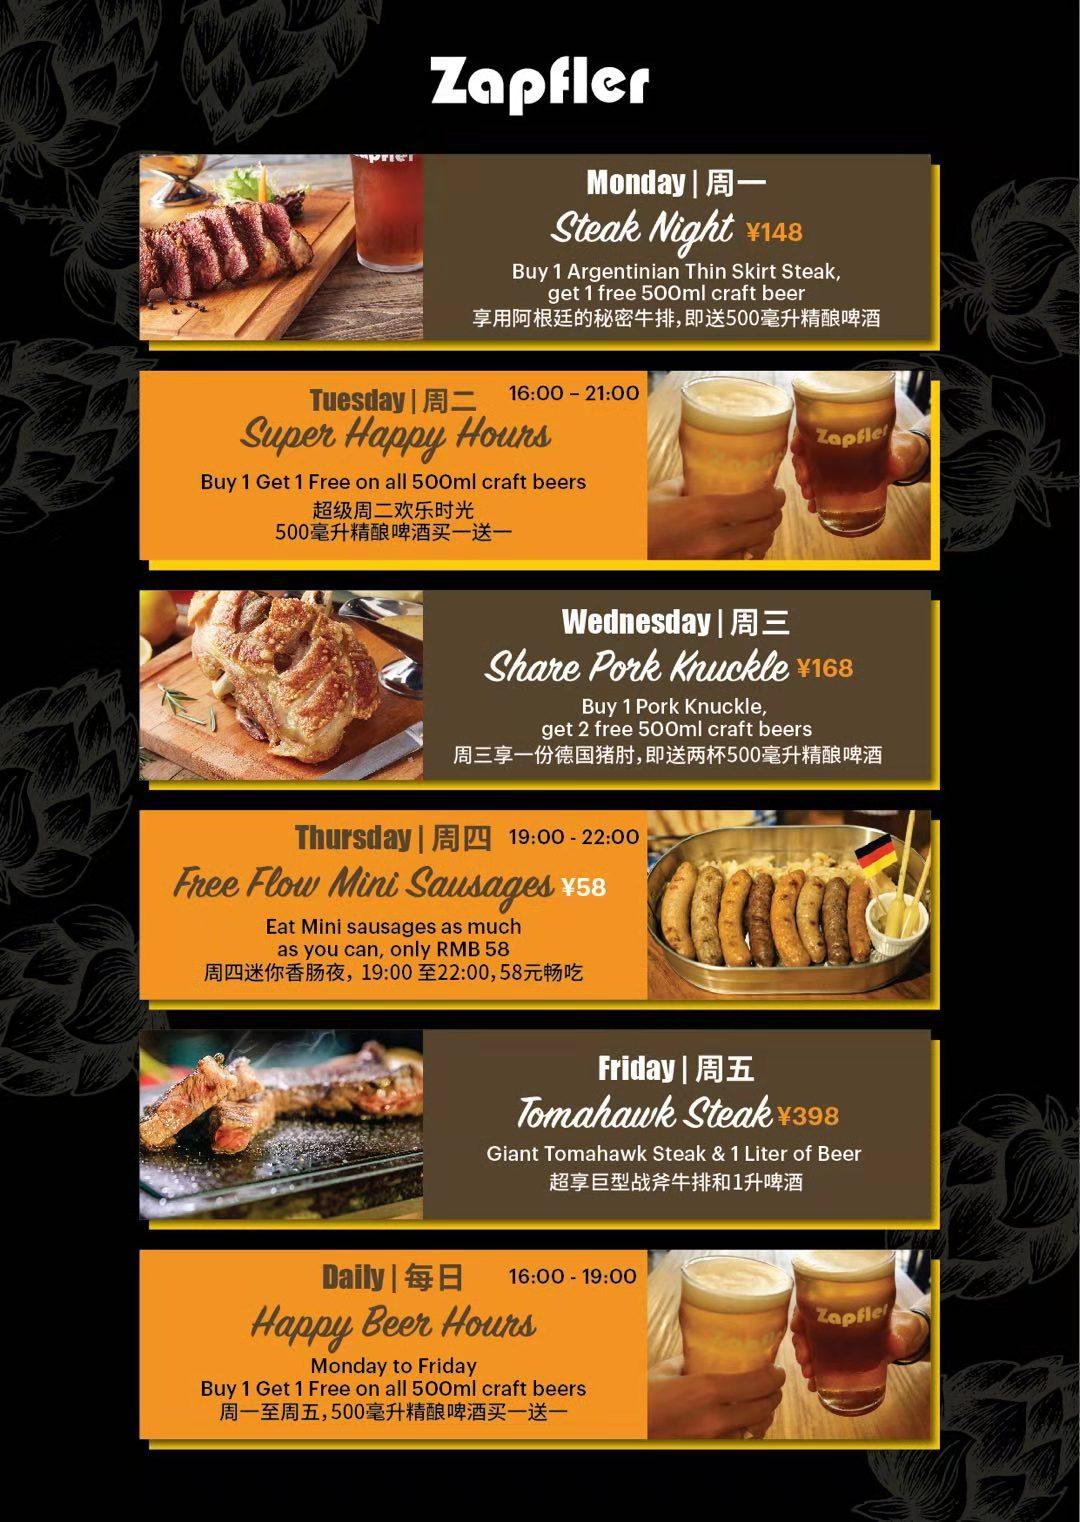 http://zapfler-craft-beer.com/wp-content/uploads/2019/08/Zapfler-shanghai-weekly-promotions-deals.jpg